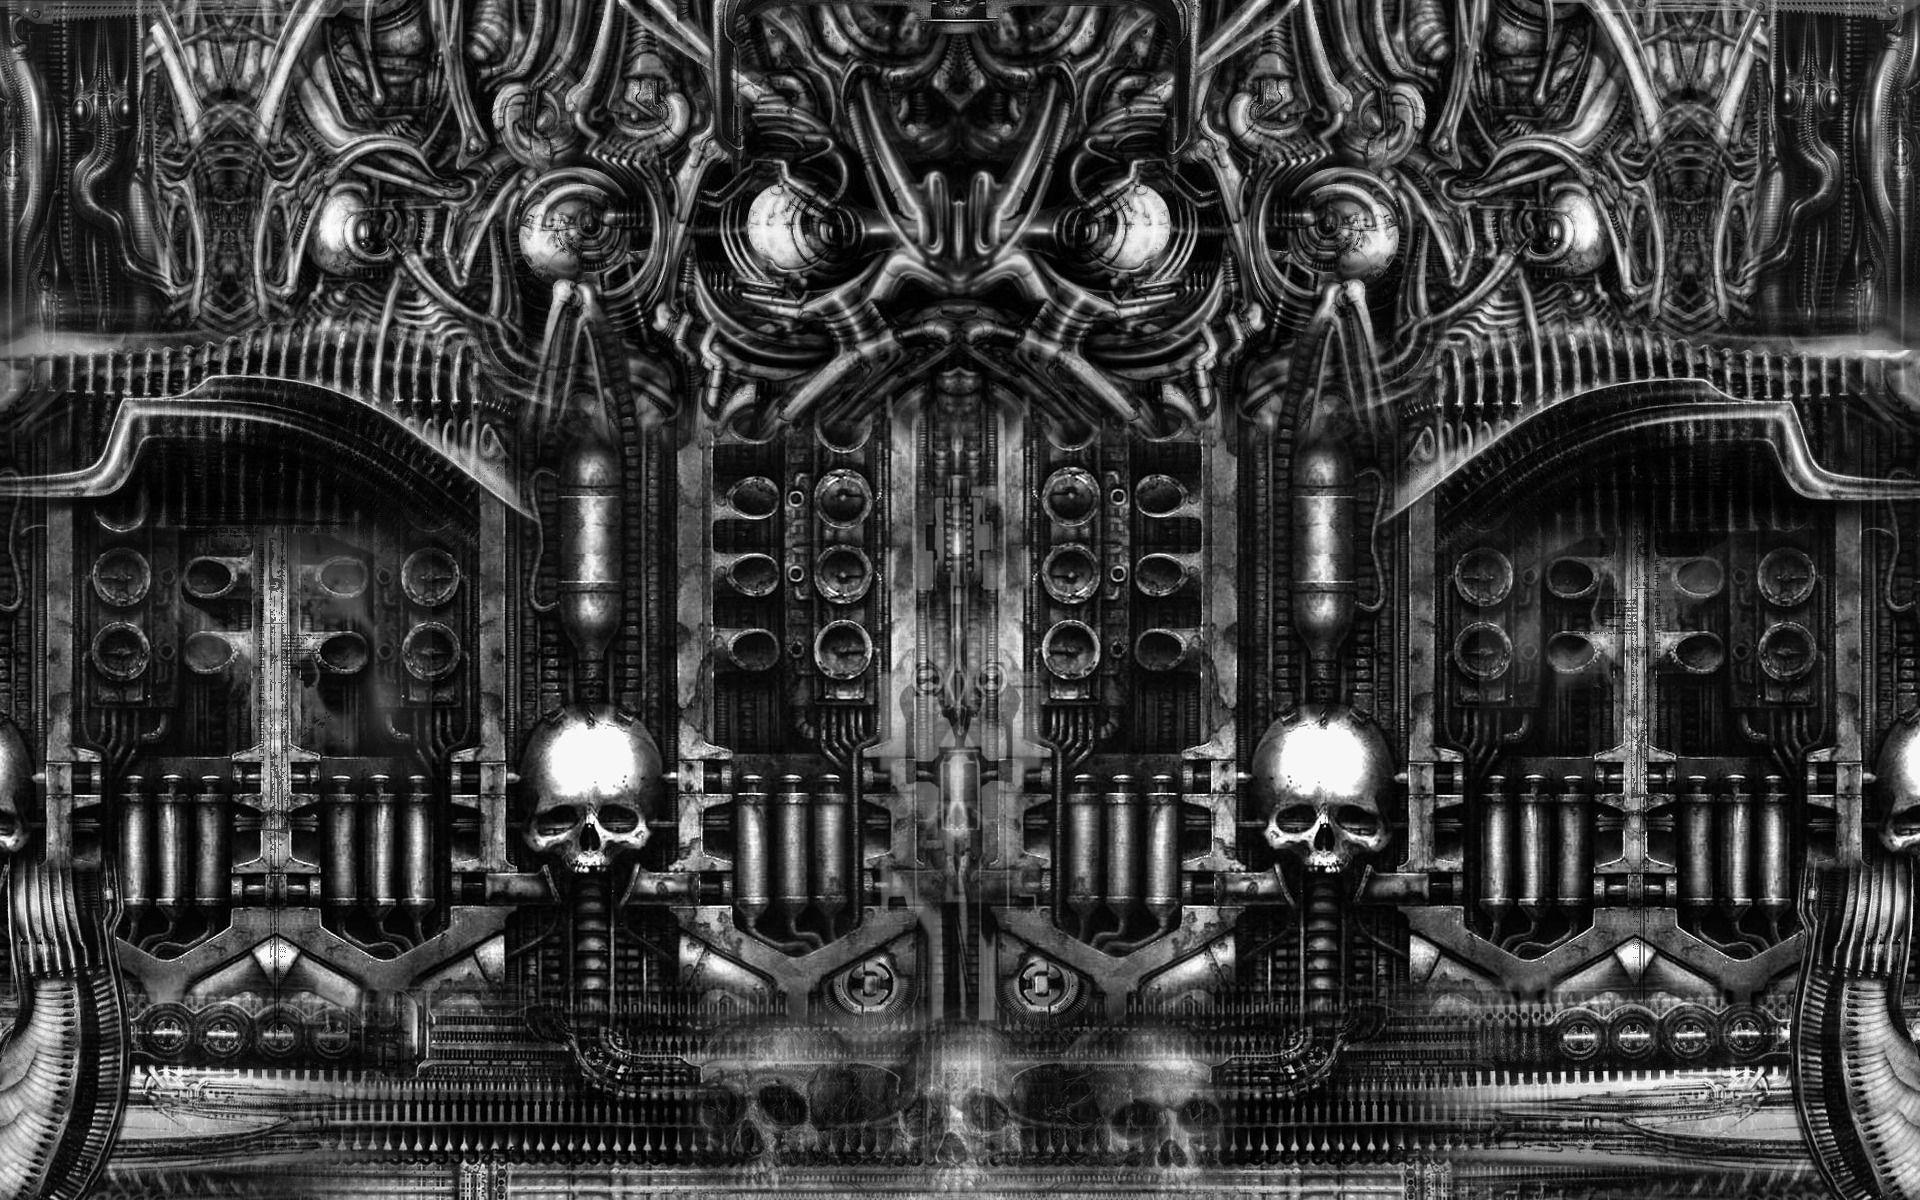 necronomicon 1,2 giger art | PC tapety a pozadia na plochu hr-giger